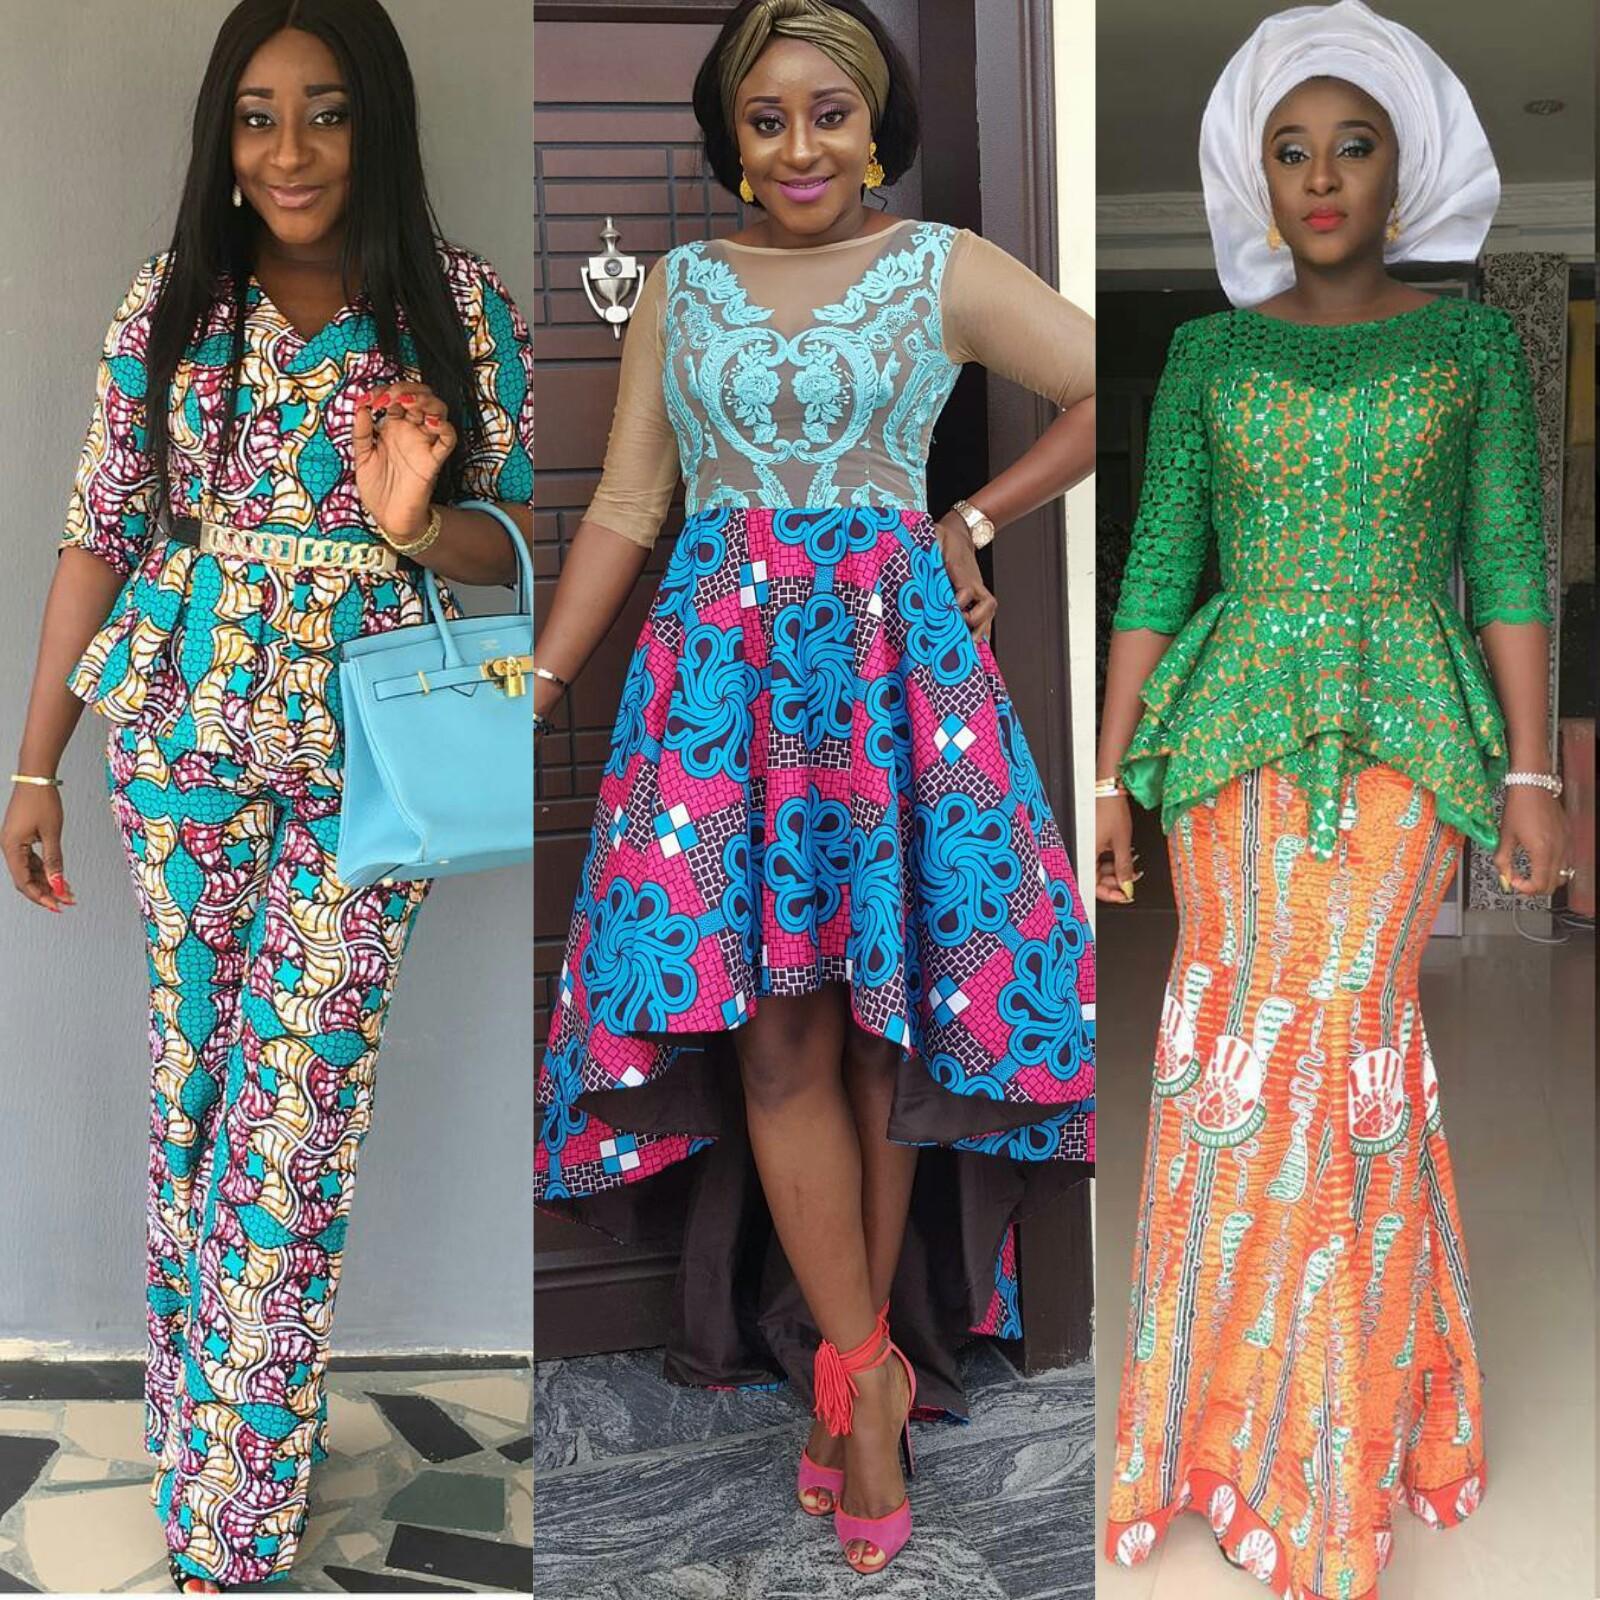 Stunning Ini Edo in African print ankara dresses | fashenista